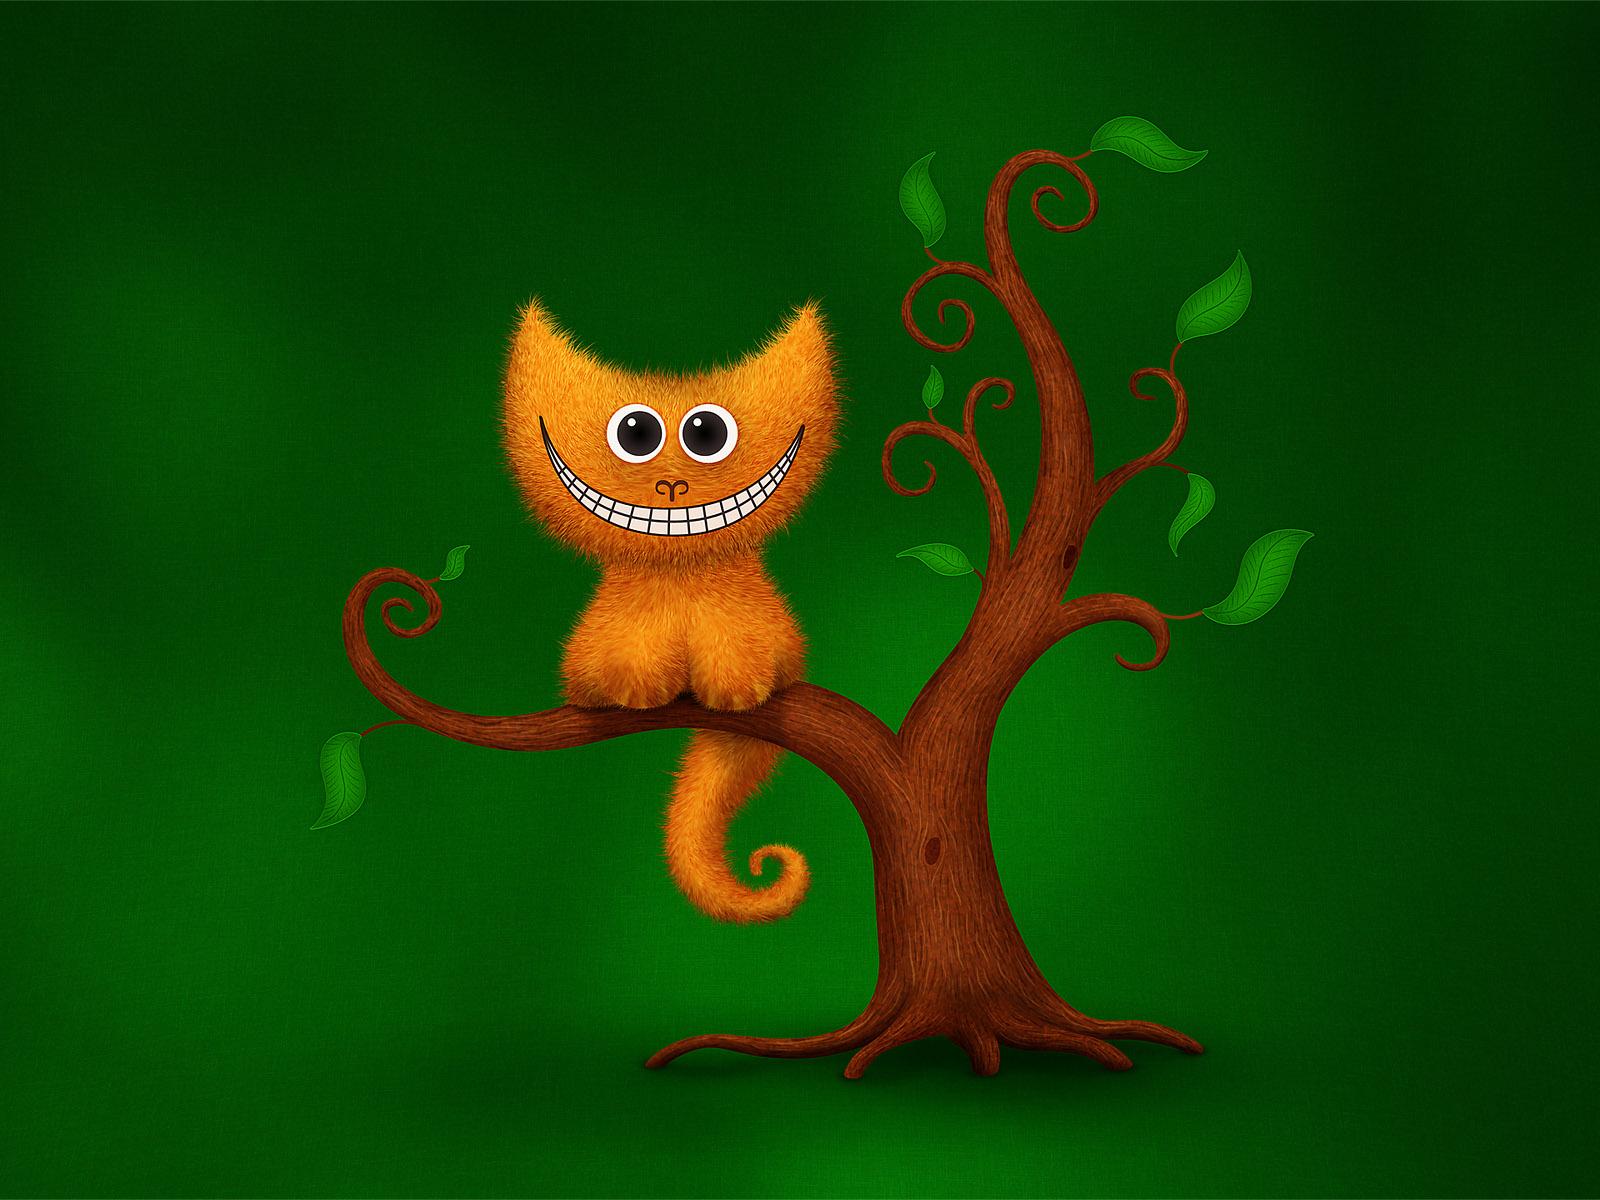 обои, рисунок, кошки, котенок на дереве, рыжий кот